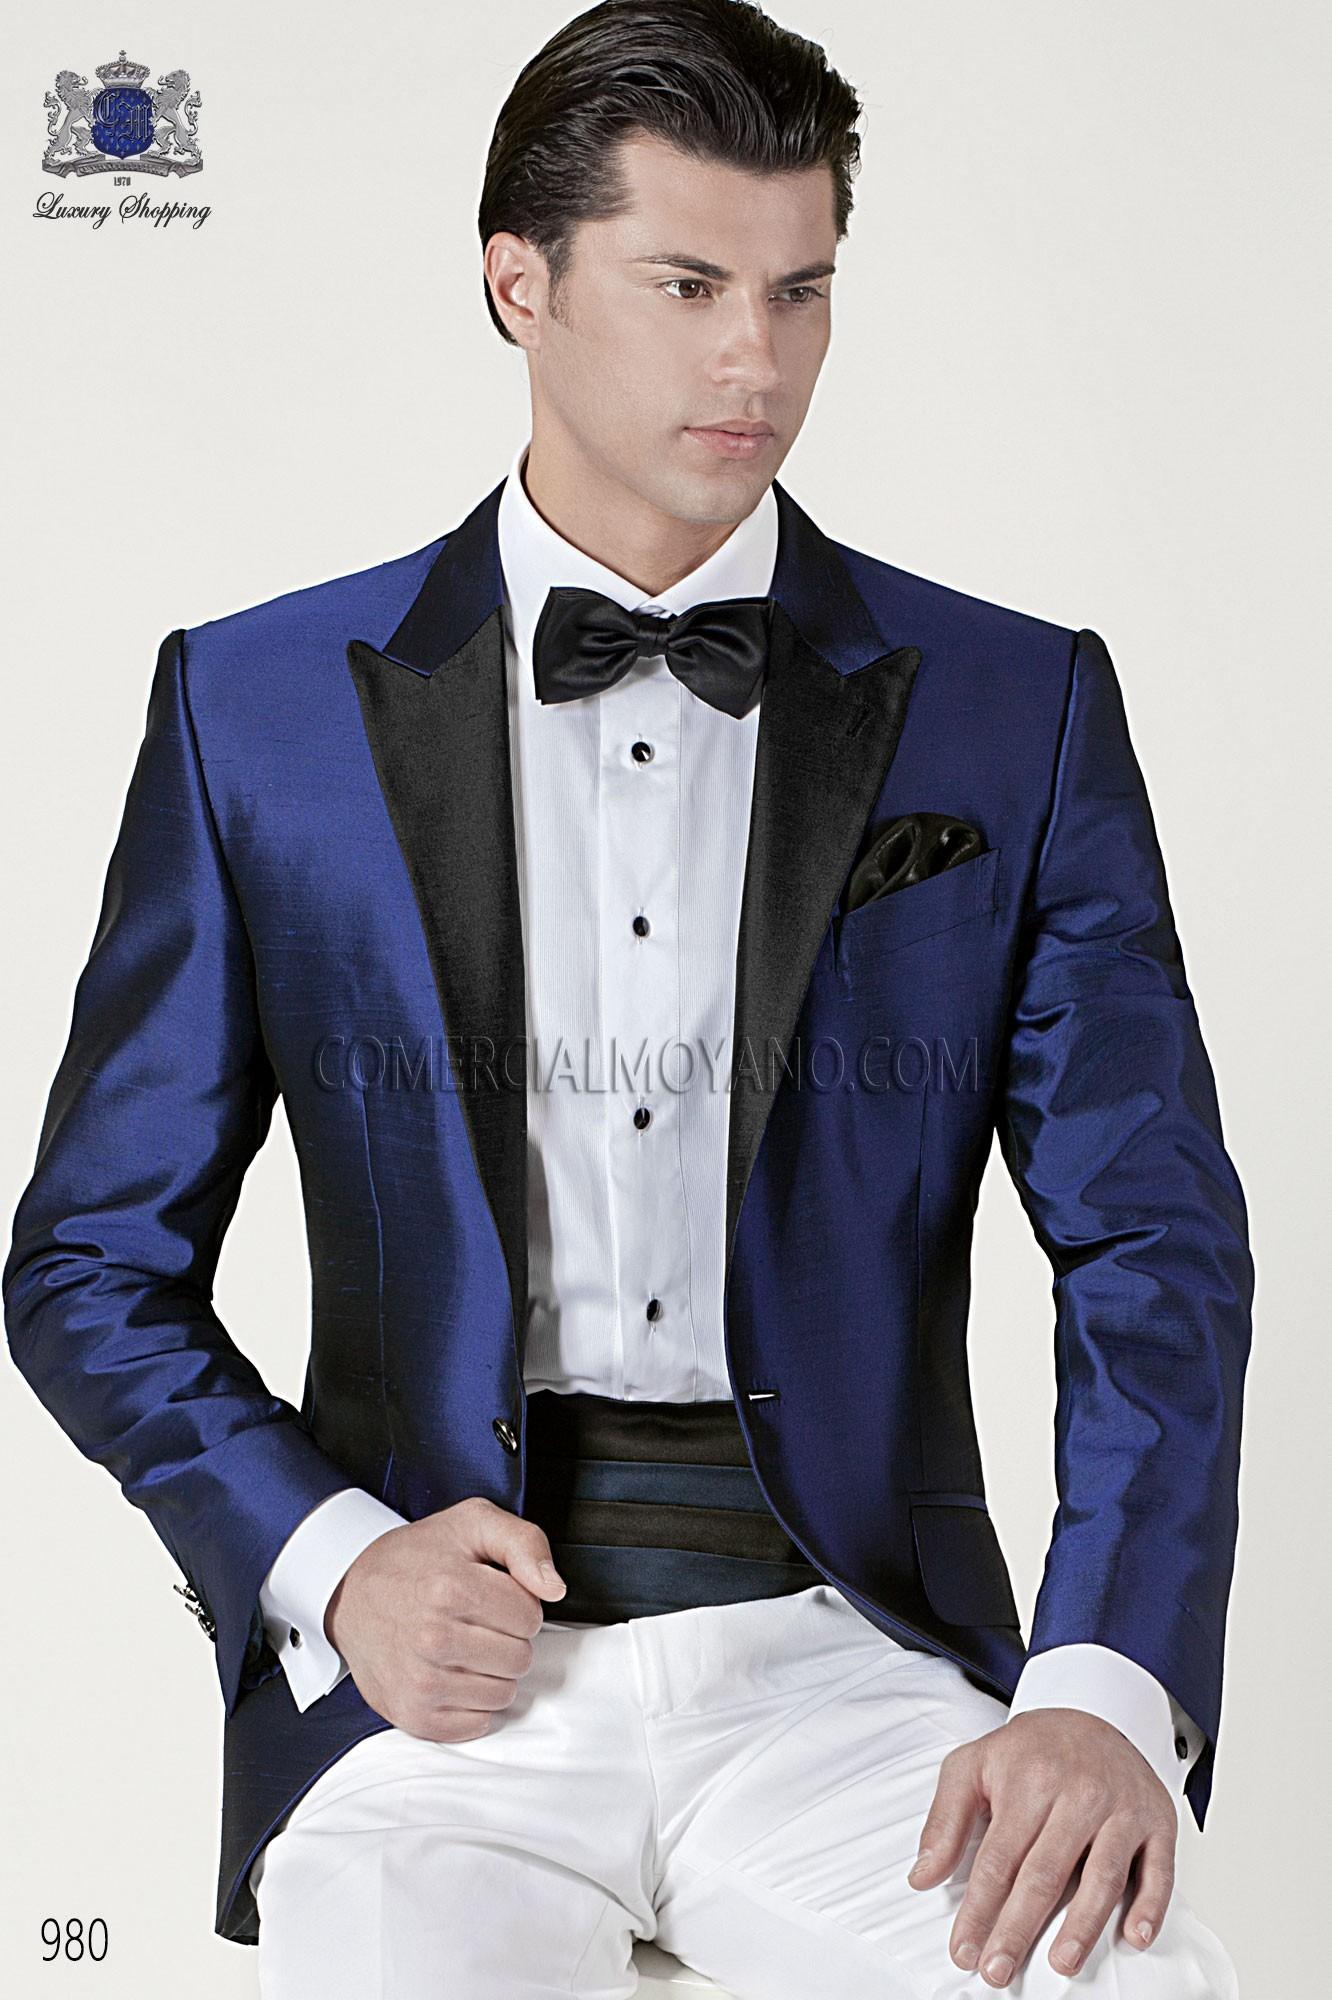 52750a831599a Traje de novio smoking azul royal 980 Ottavio Nuccio Gala. Loading zoom